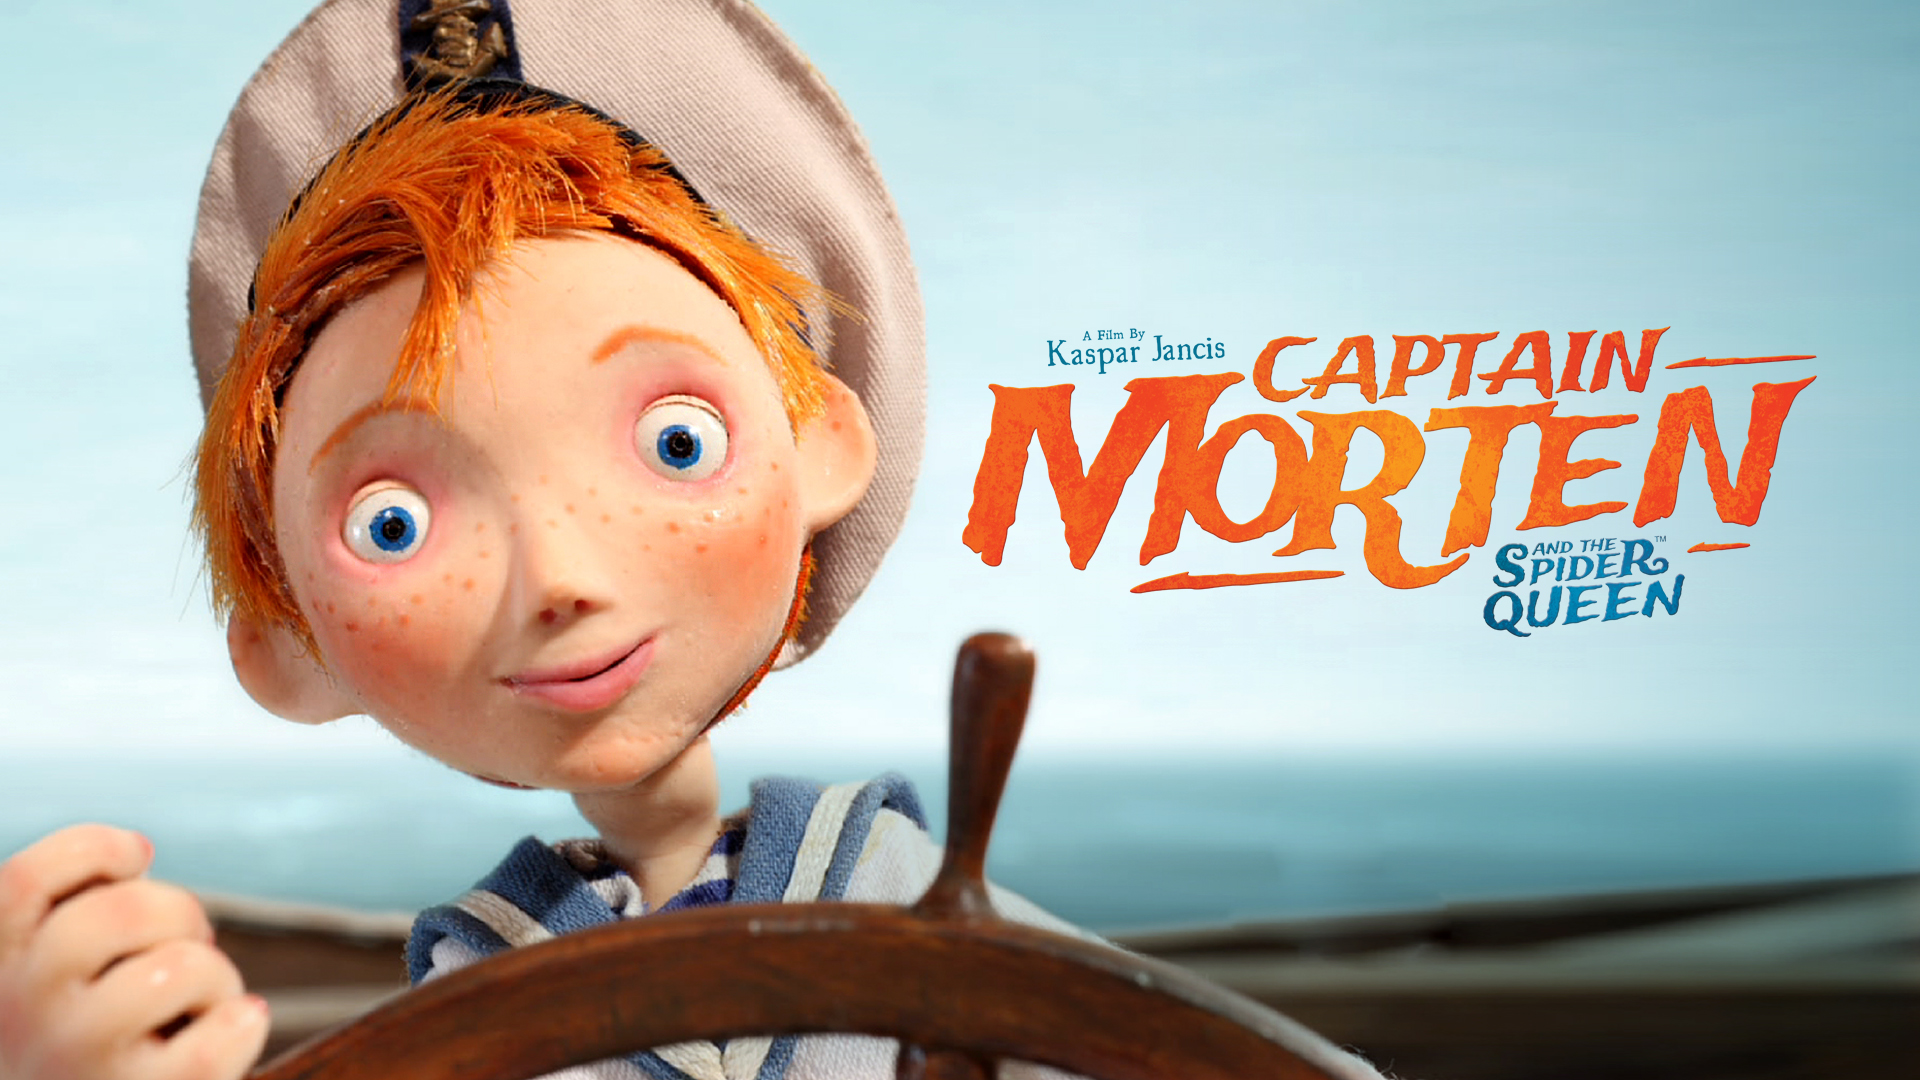 Captain_Morten_and_the_Spider_Queen_Social_Media_001.jpg